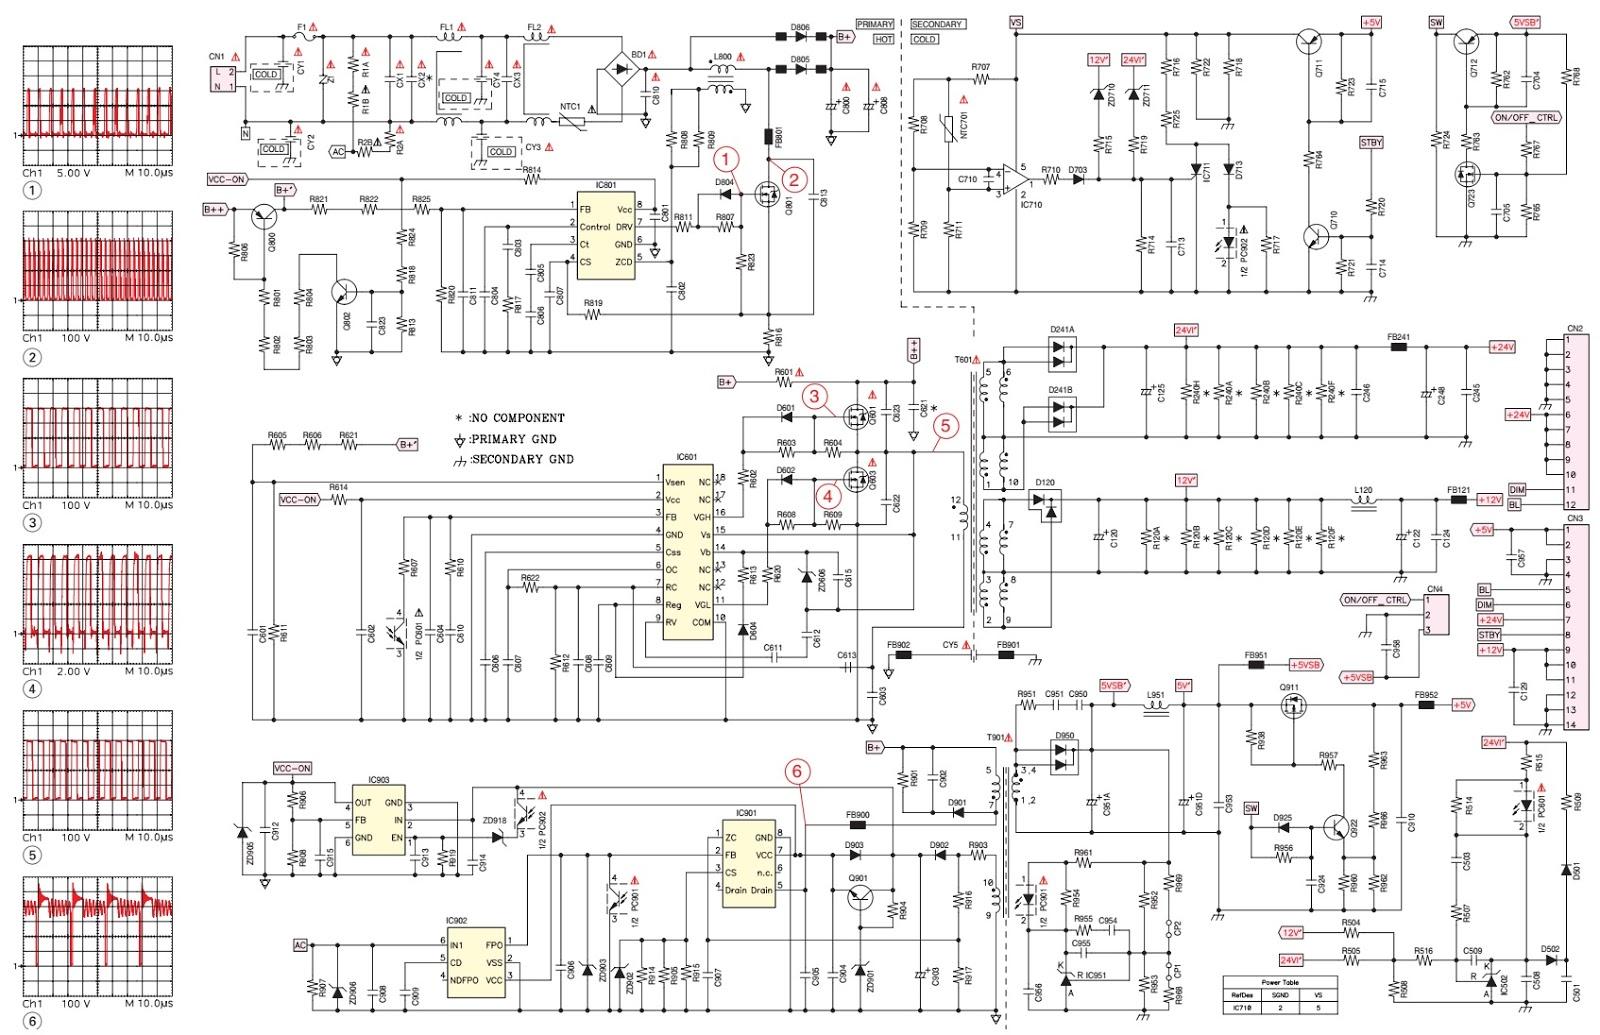 medium resolution of grundig lcd tv smps circuit diagram dps 145pp 133 electro help inverter pcb board circuit diagram inverter pcb board circuit diagram